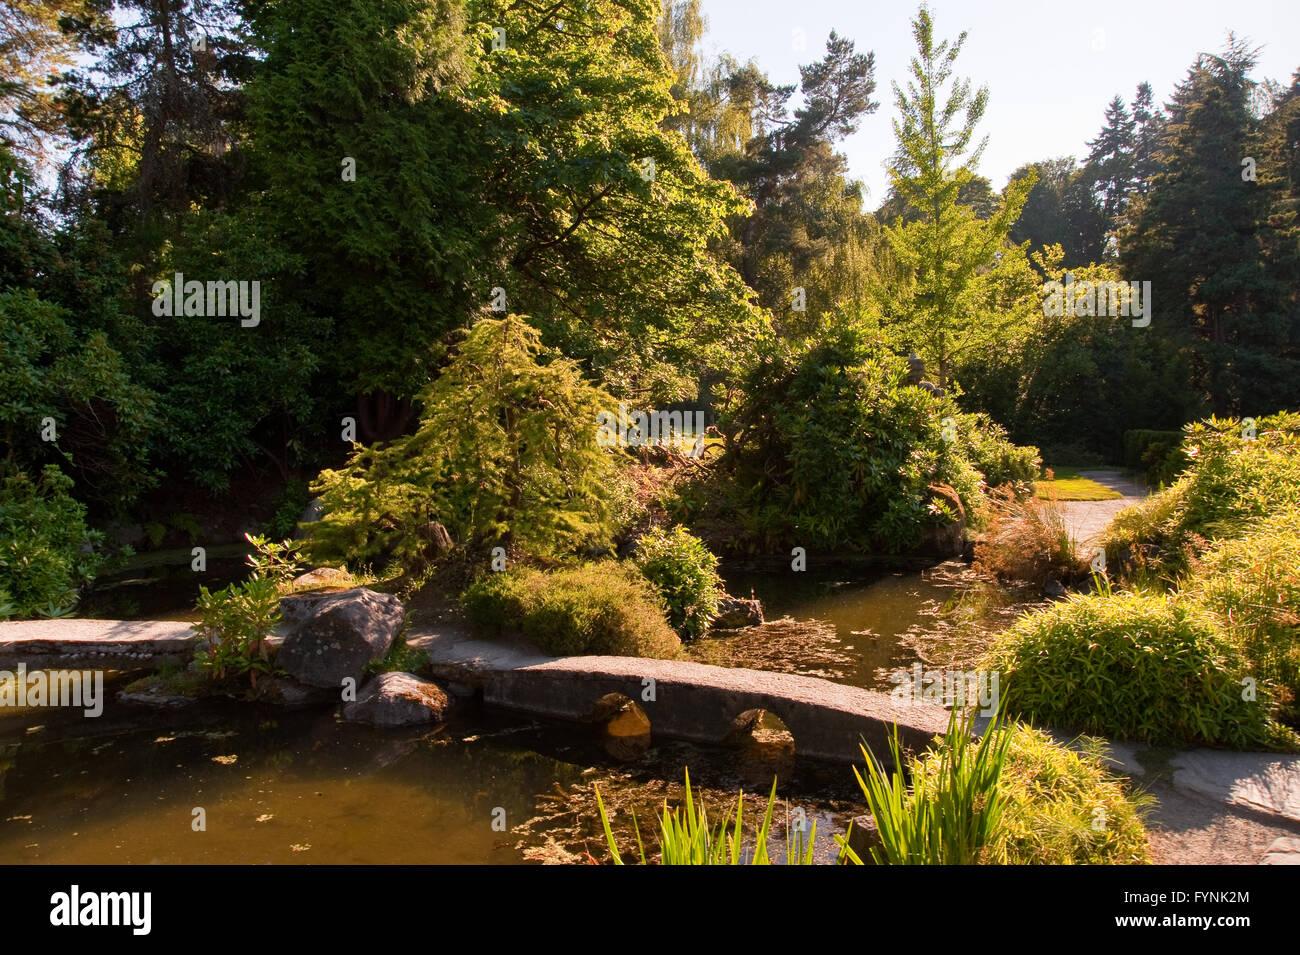 Kubota Garden in Seattle WA Stock Photo: 103123516 - Alamy